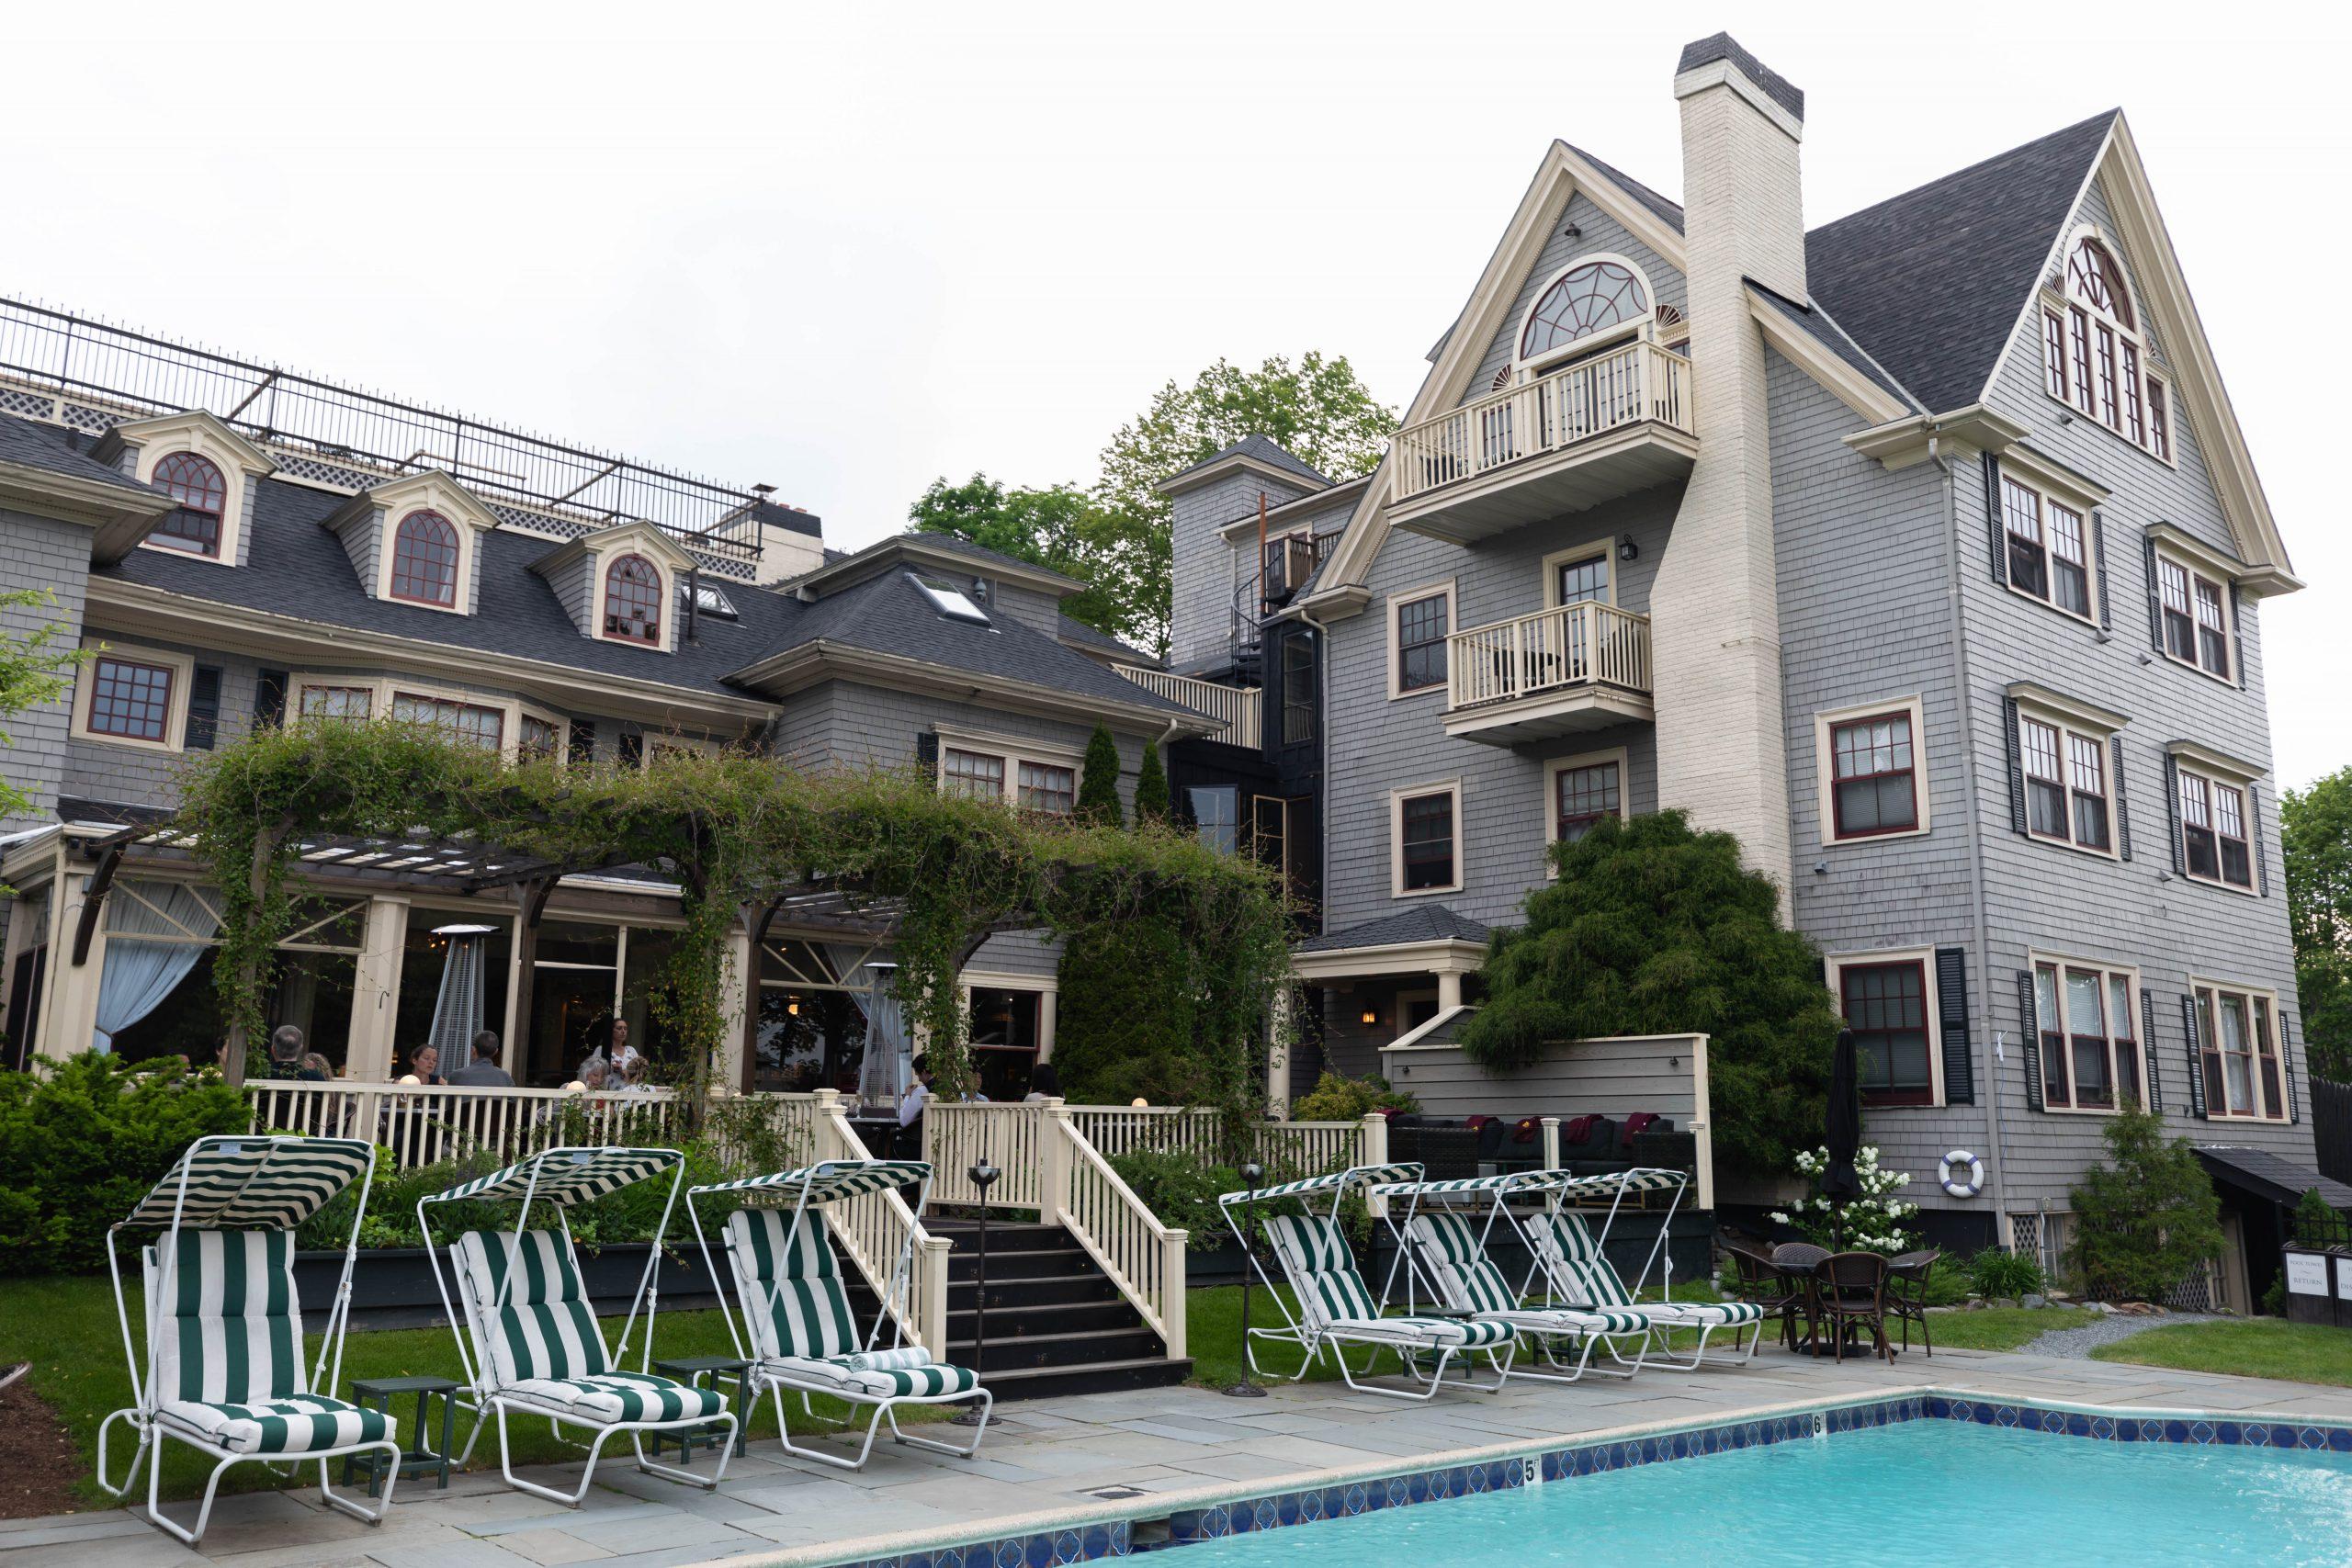 Balance Rock Inn in Bar Harbor Maine Written and Photographed by Luxury Travel Writer Annie Fairfax